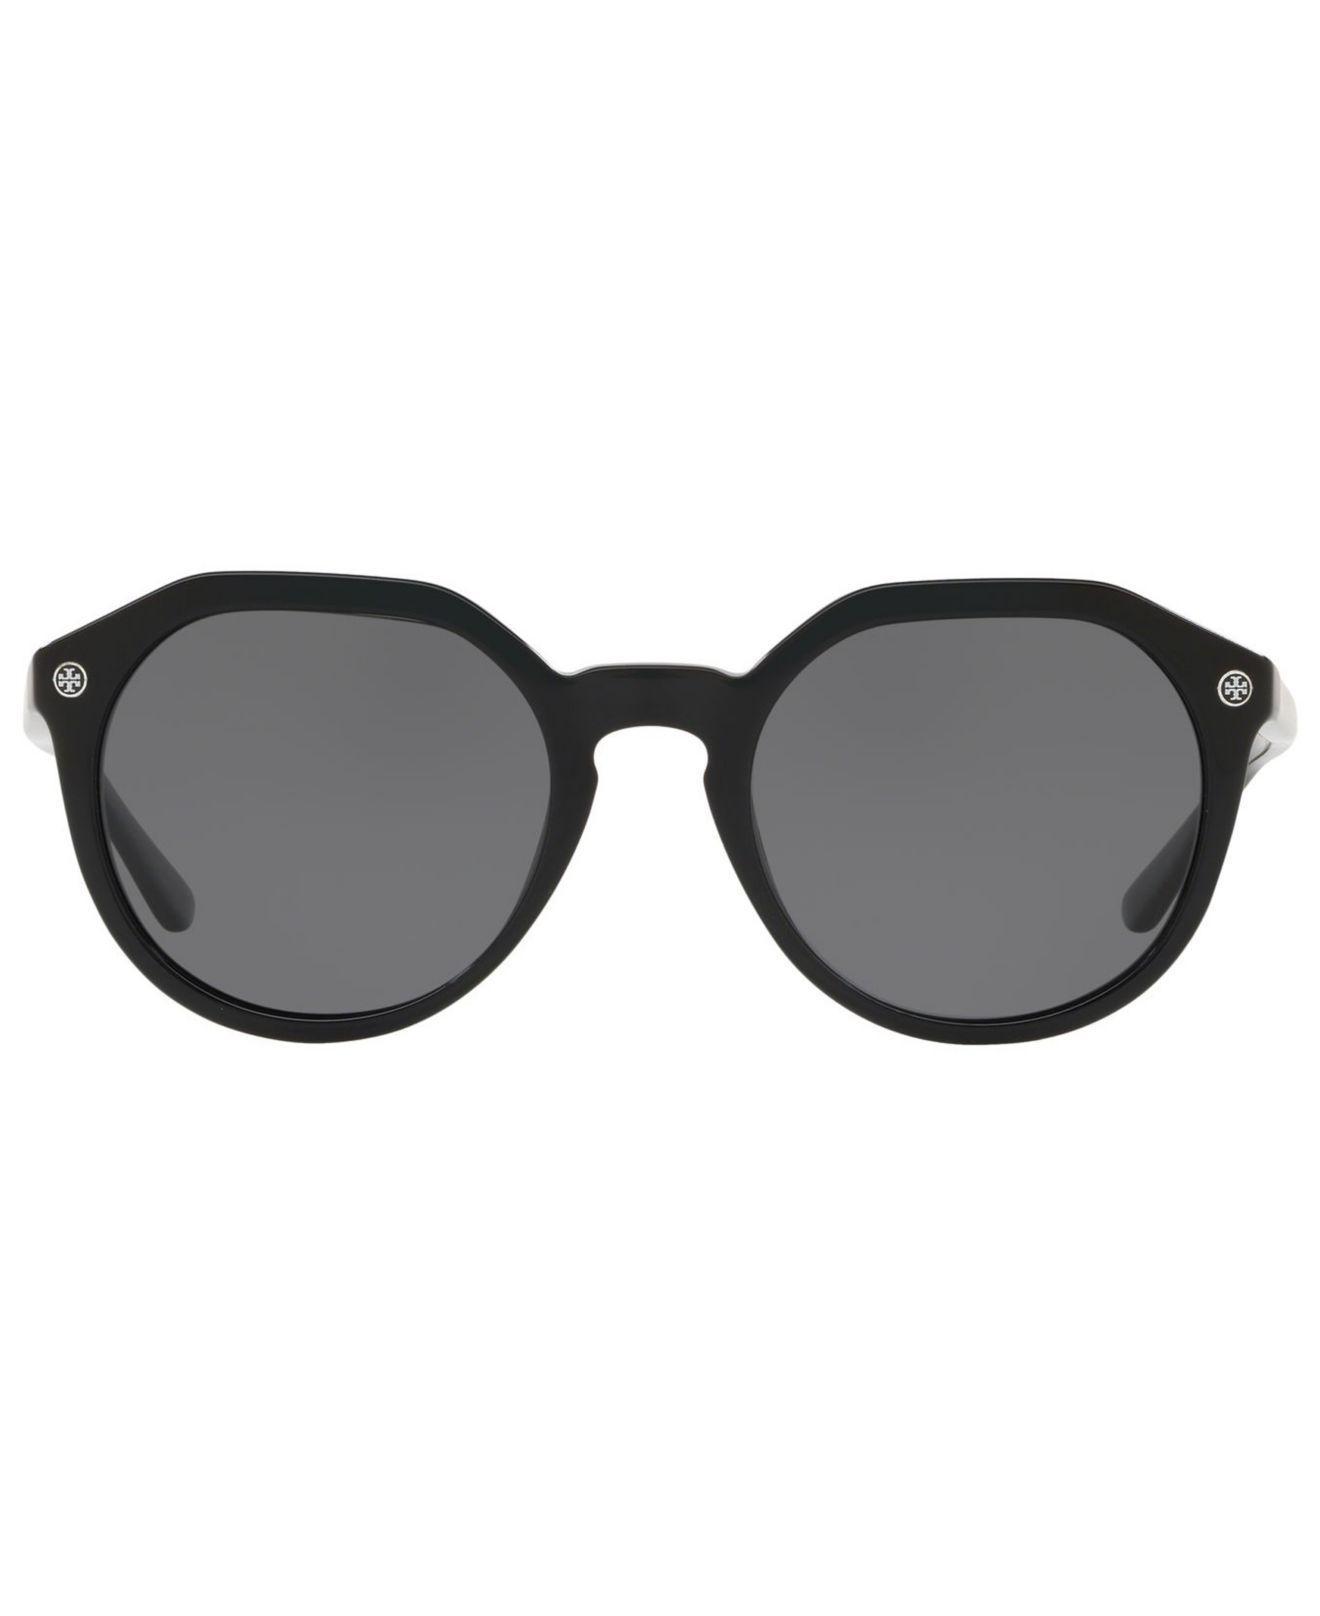 ecaa397cab Lyst - Tory Burch Polarized Sunglasses